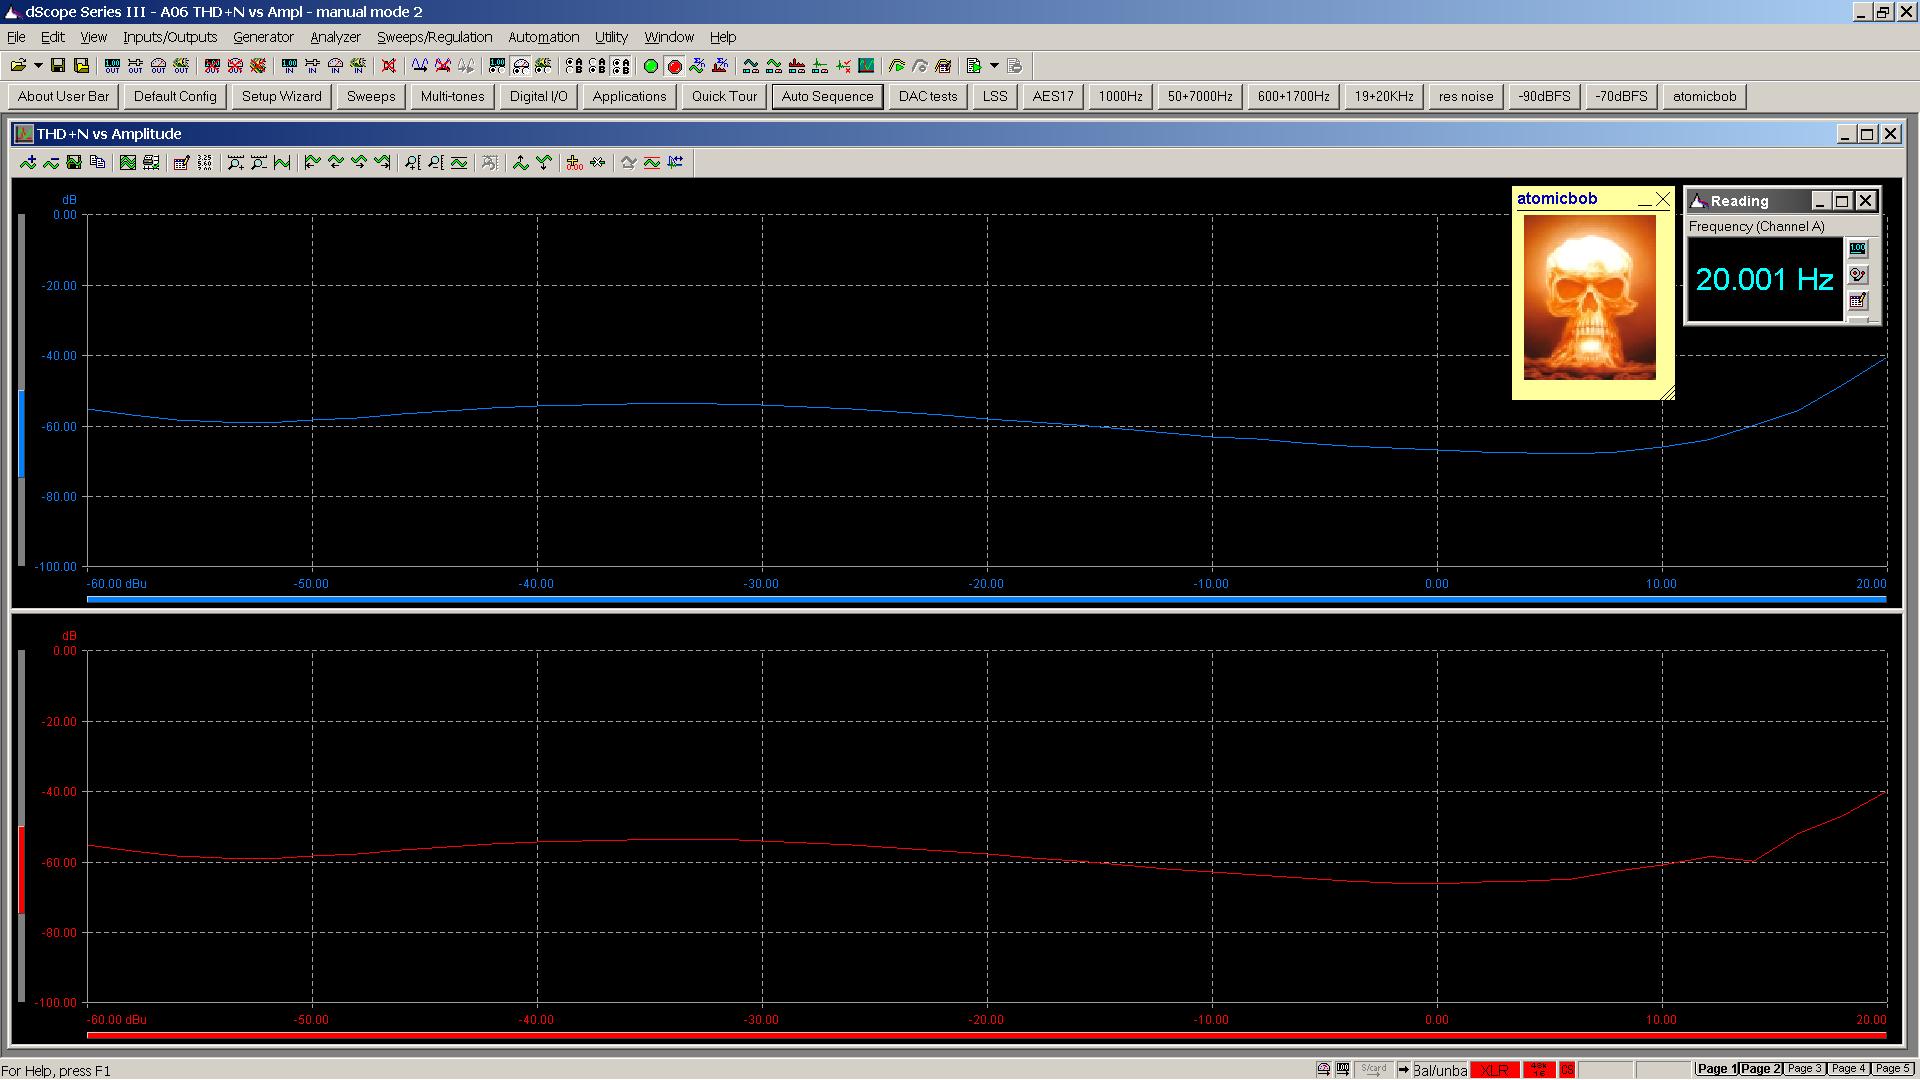 20181030 ISO Twin 20 Hz THD+N vs Amplitude 100K - v2.png